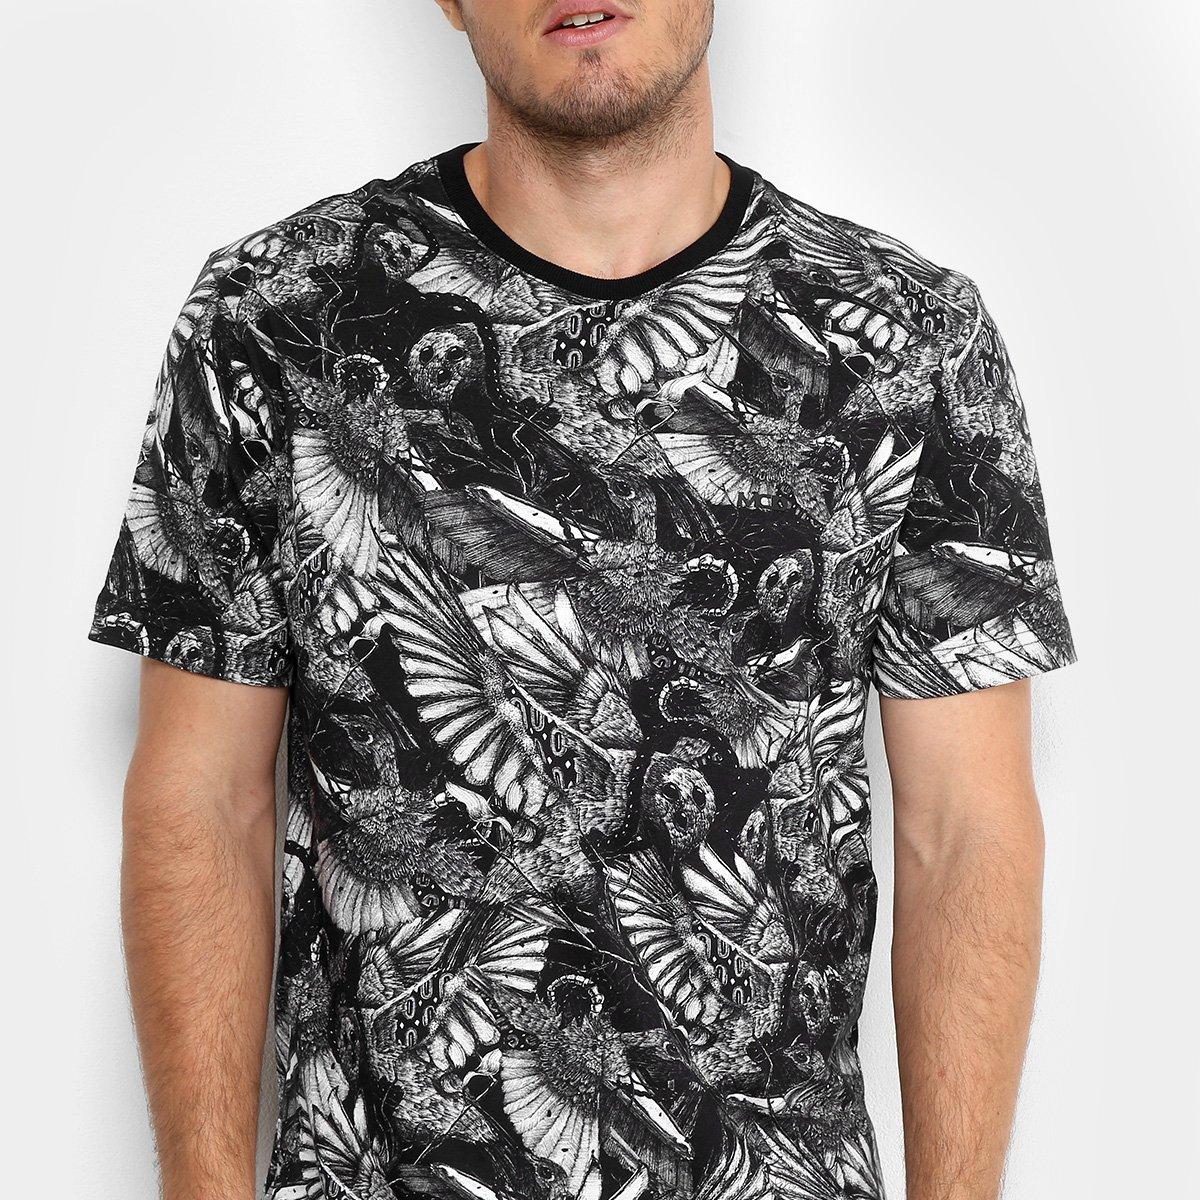 ... Camiseta MCD Especial Full Bird Bloom Masculina - Preto. GANHE MAIS c5aaa6b17cc